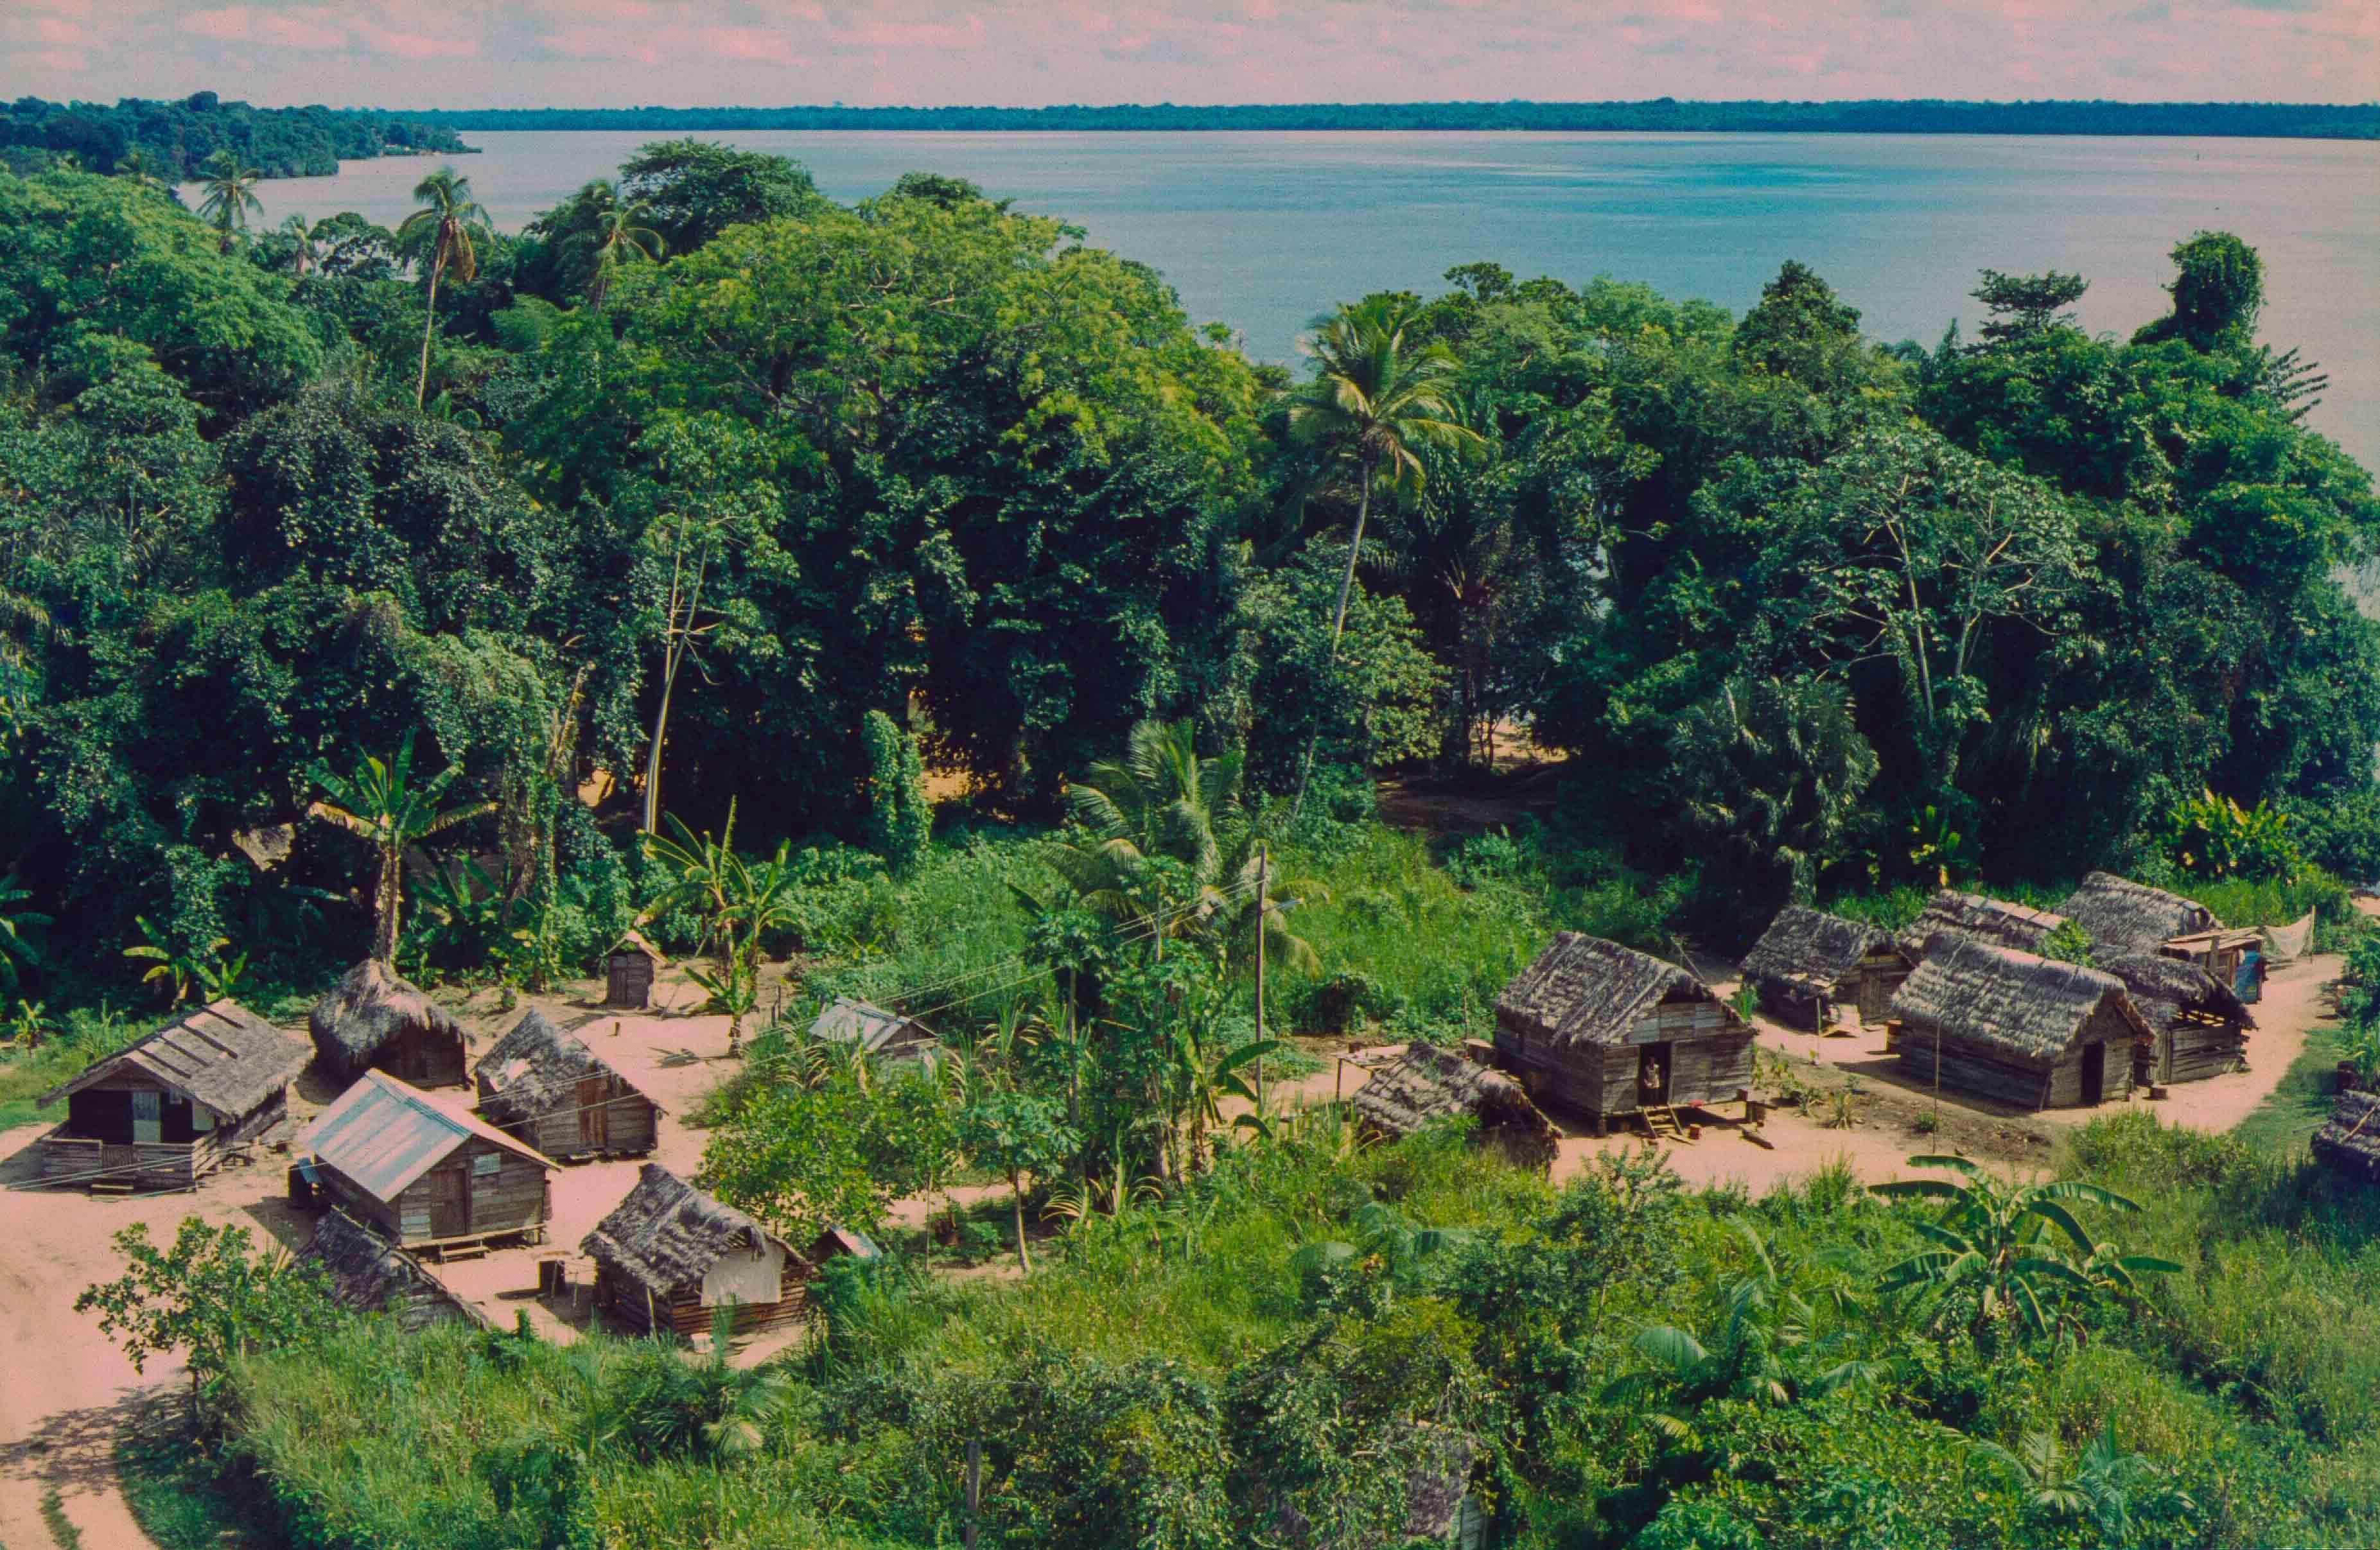 393. Suriname